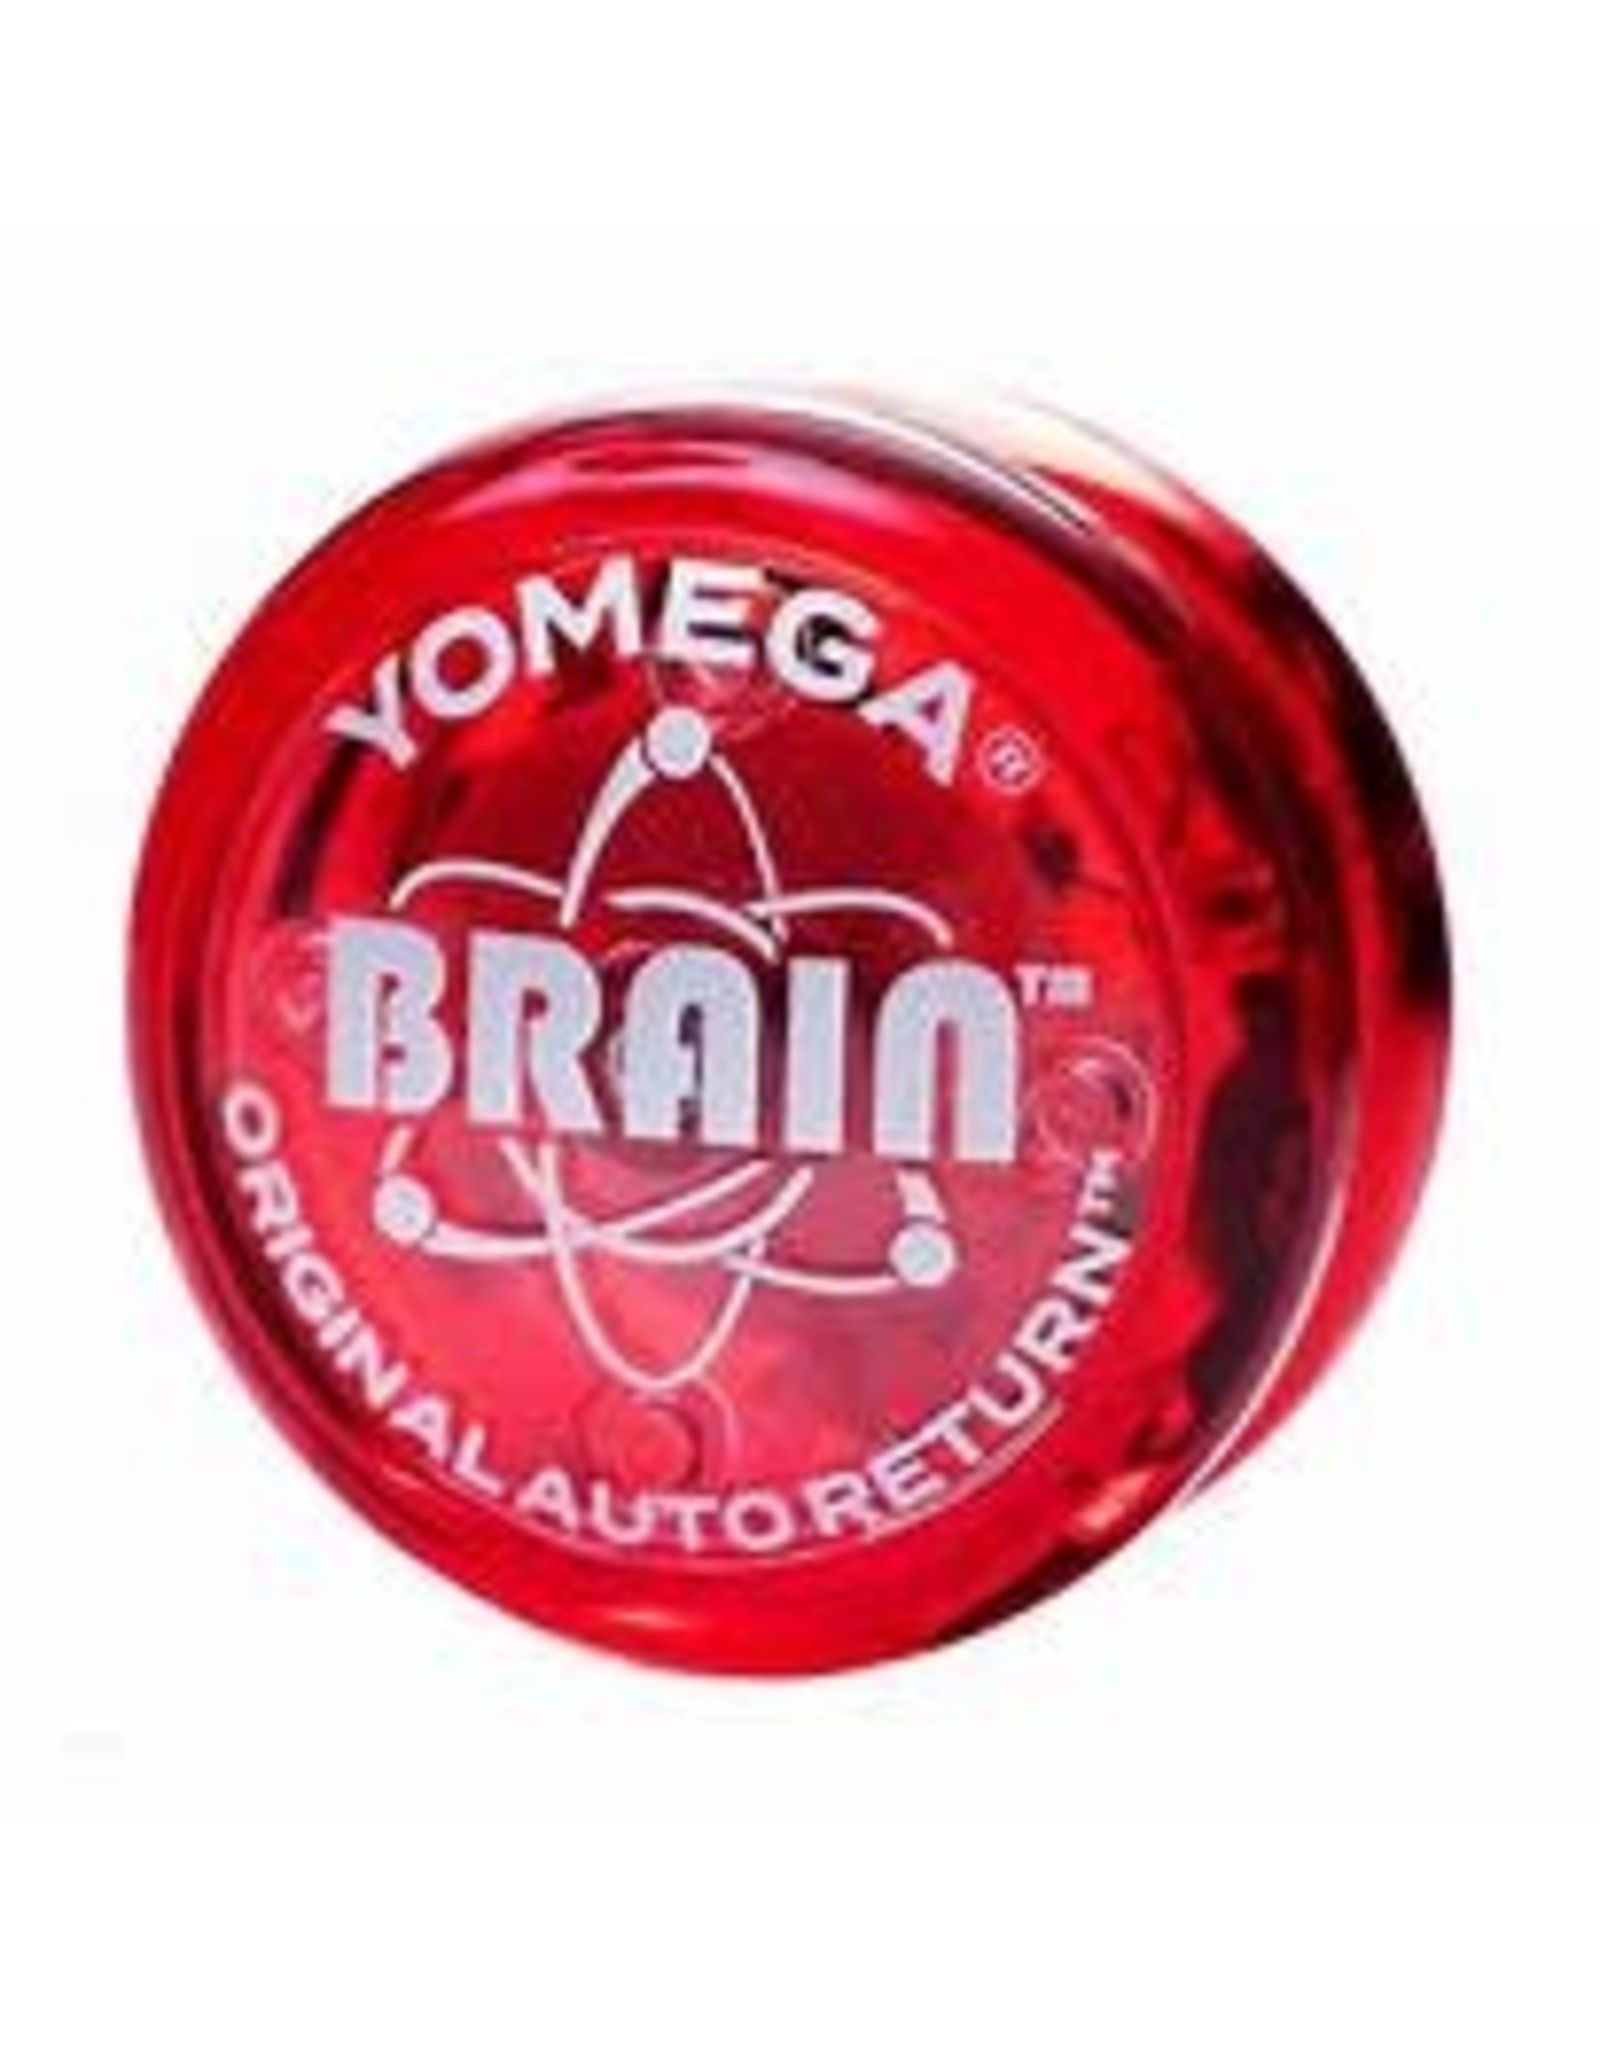 Yomega Brain - Original Auto-Return